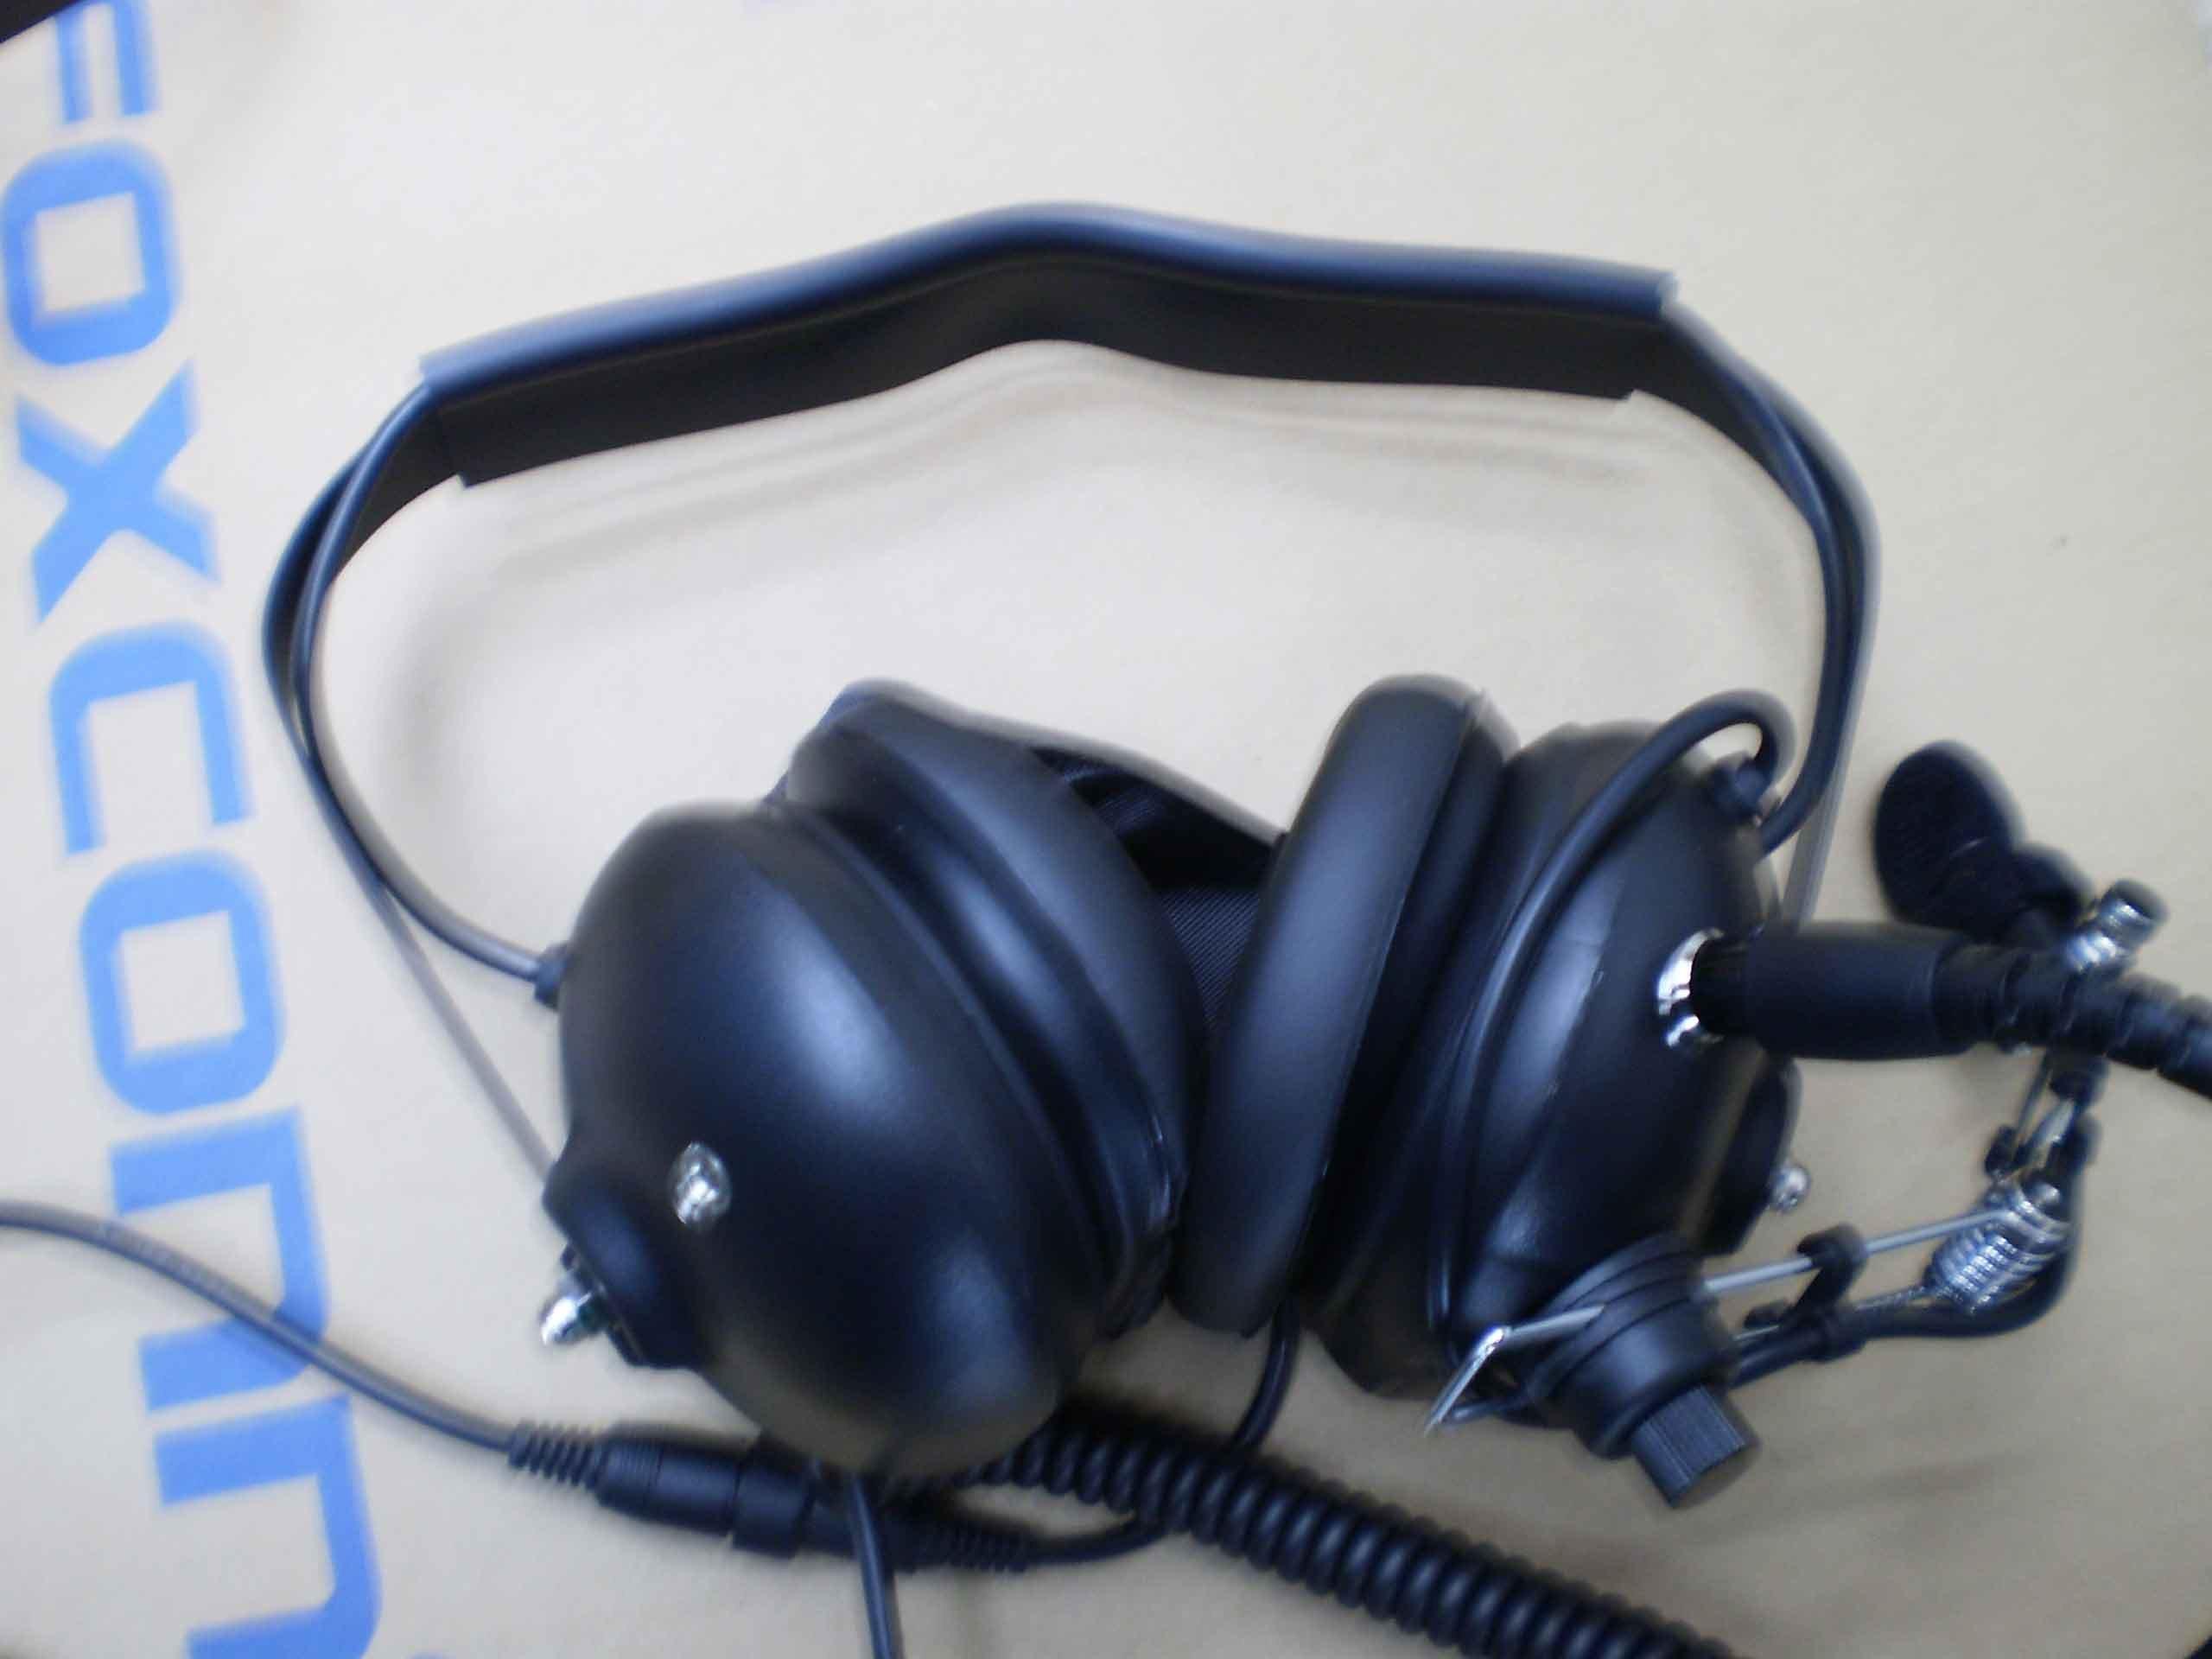 Walkies Talkies Heavy Duty Headphone/Headset/Aviation Headset H-002# for Handheld Two Way Radio(China (Mainland))